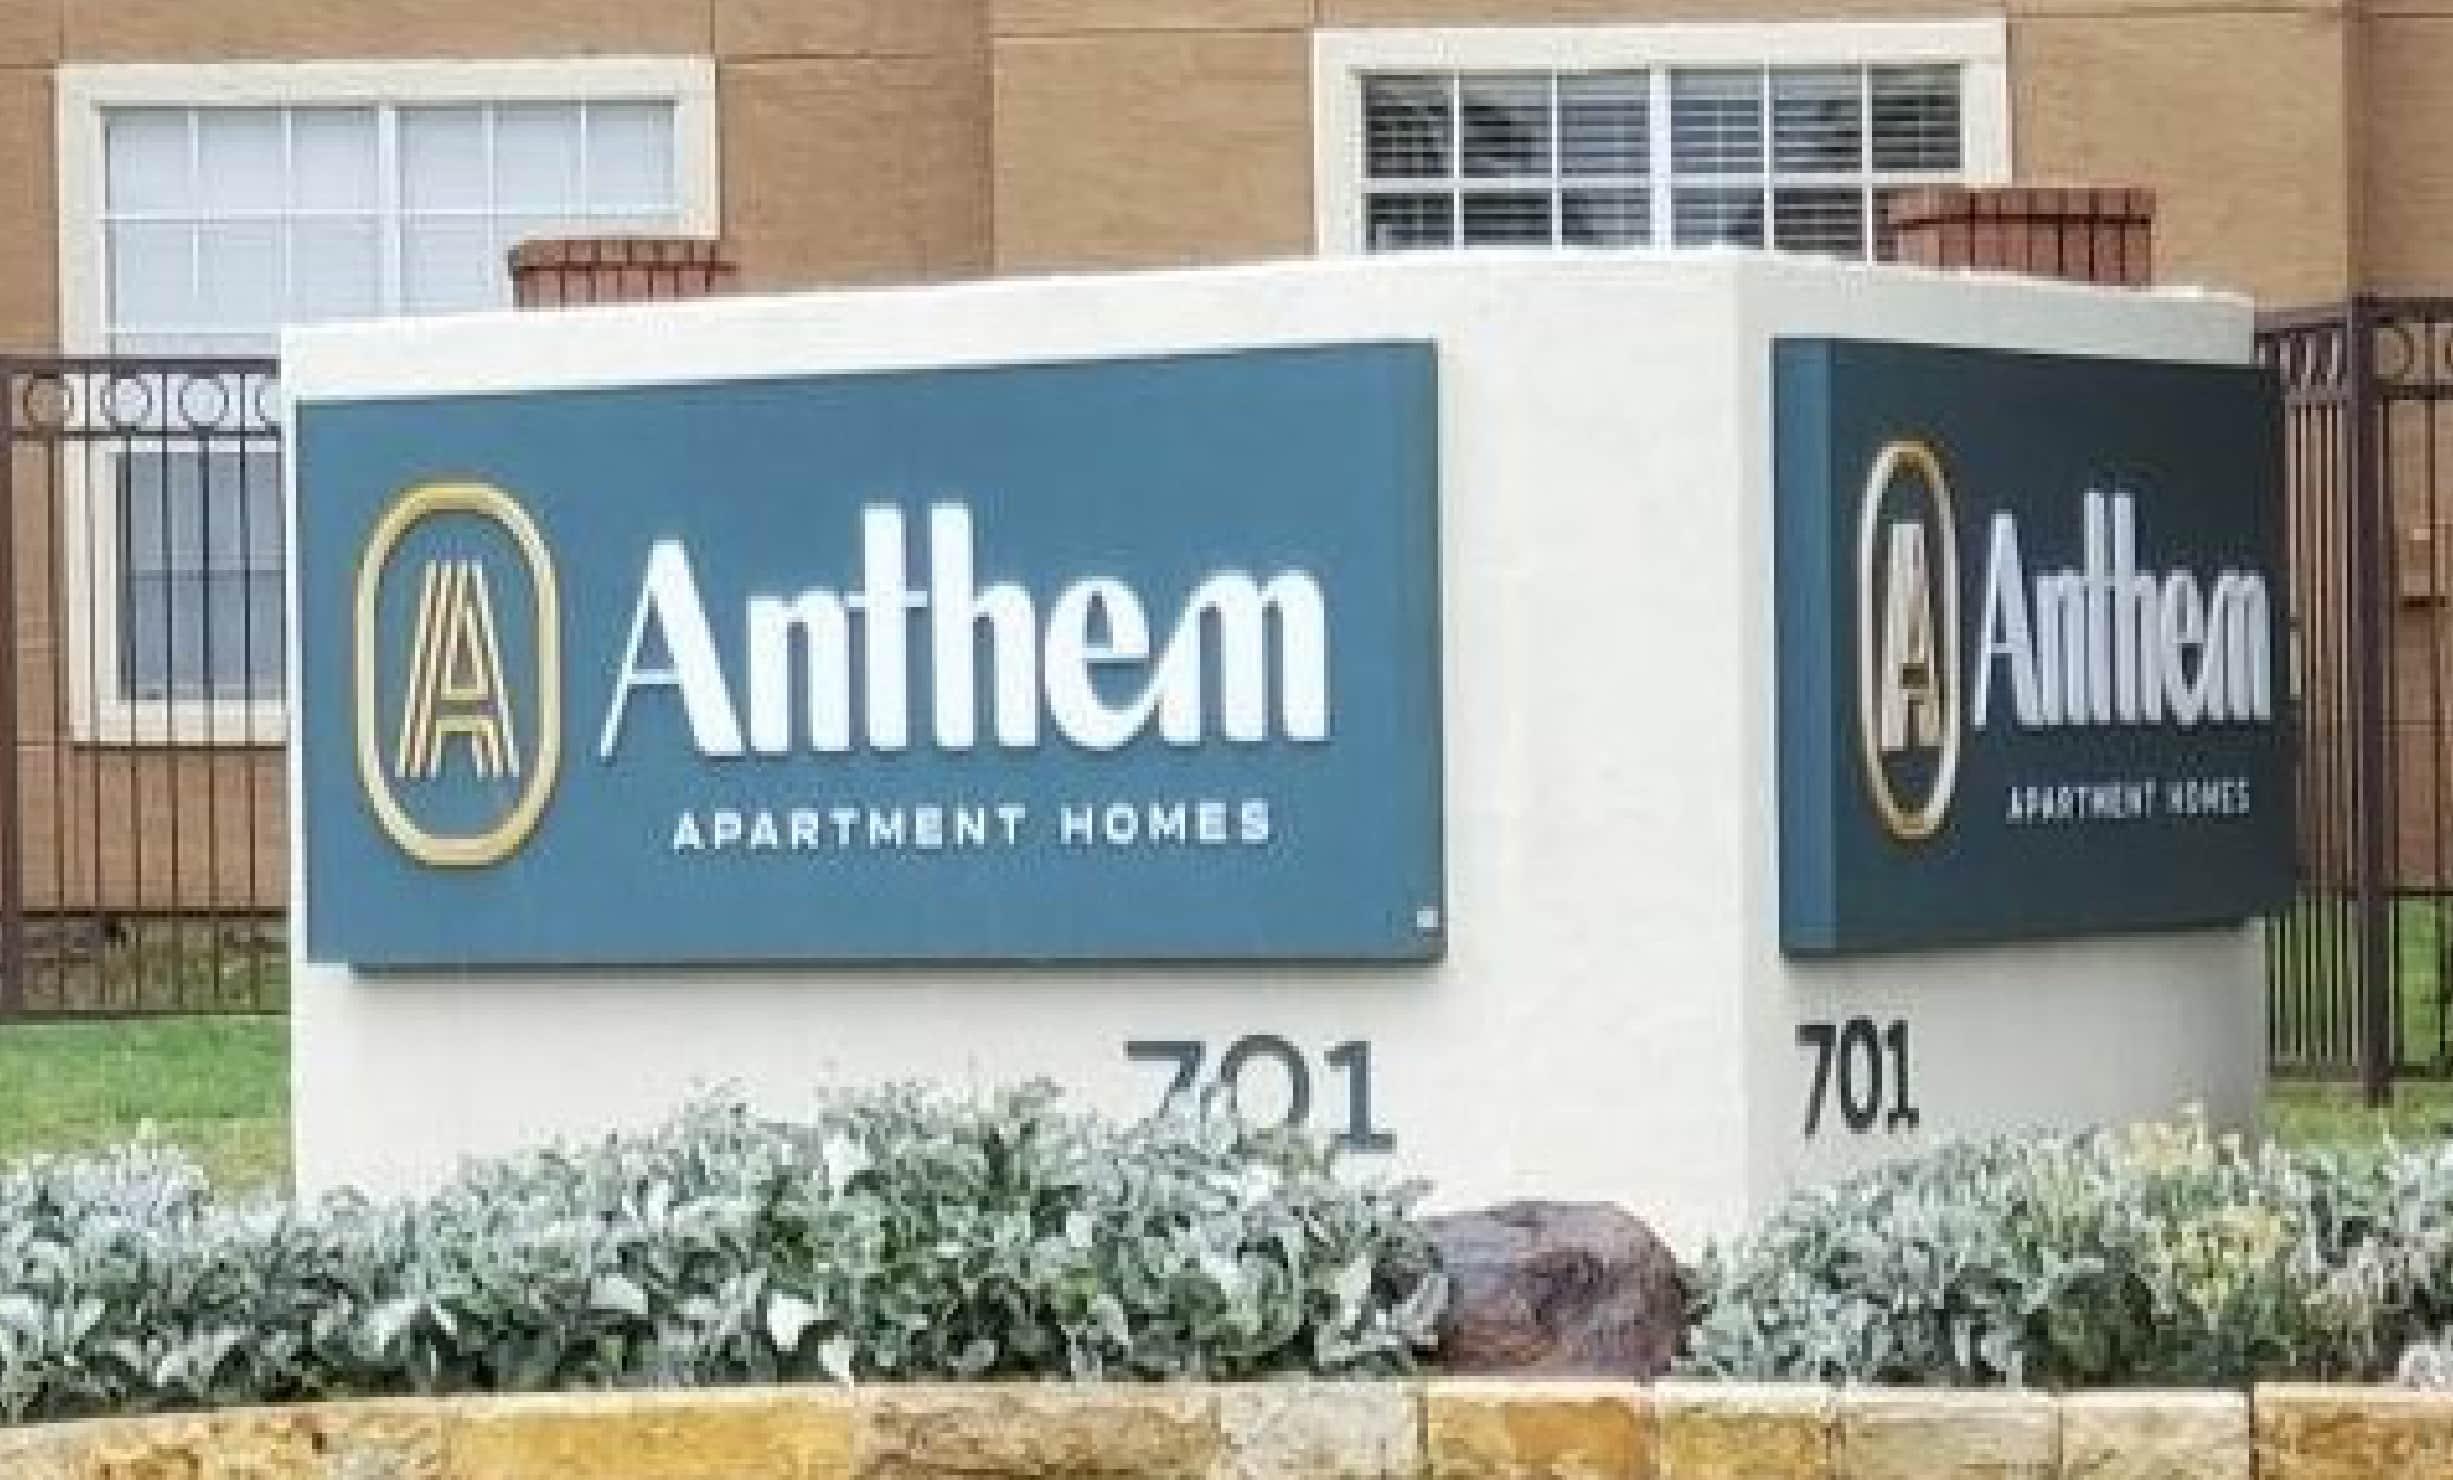 Anthem Apartment Homes sign